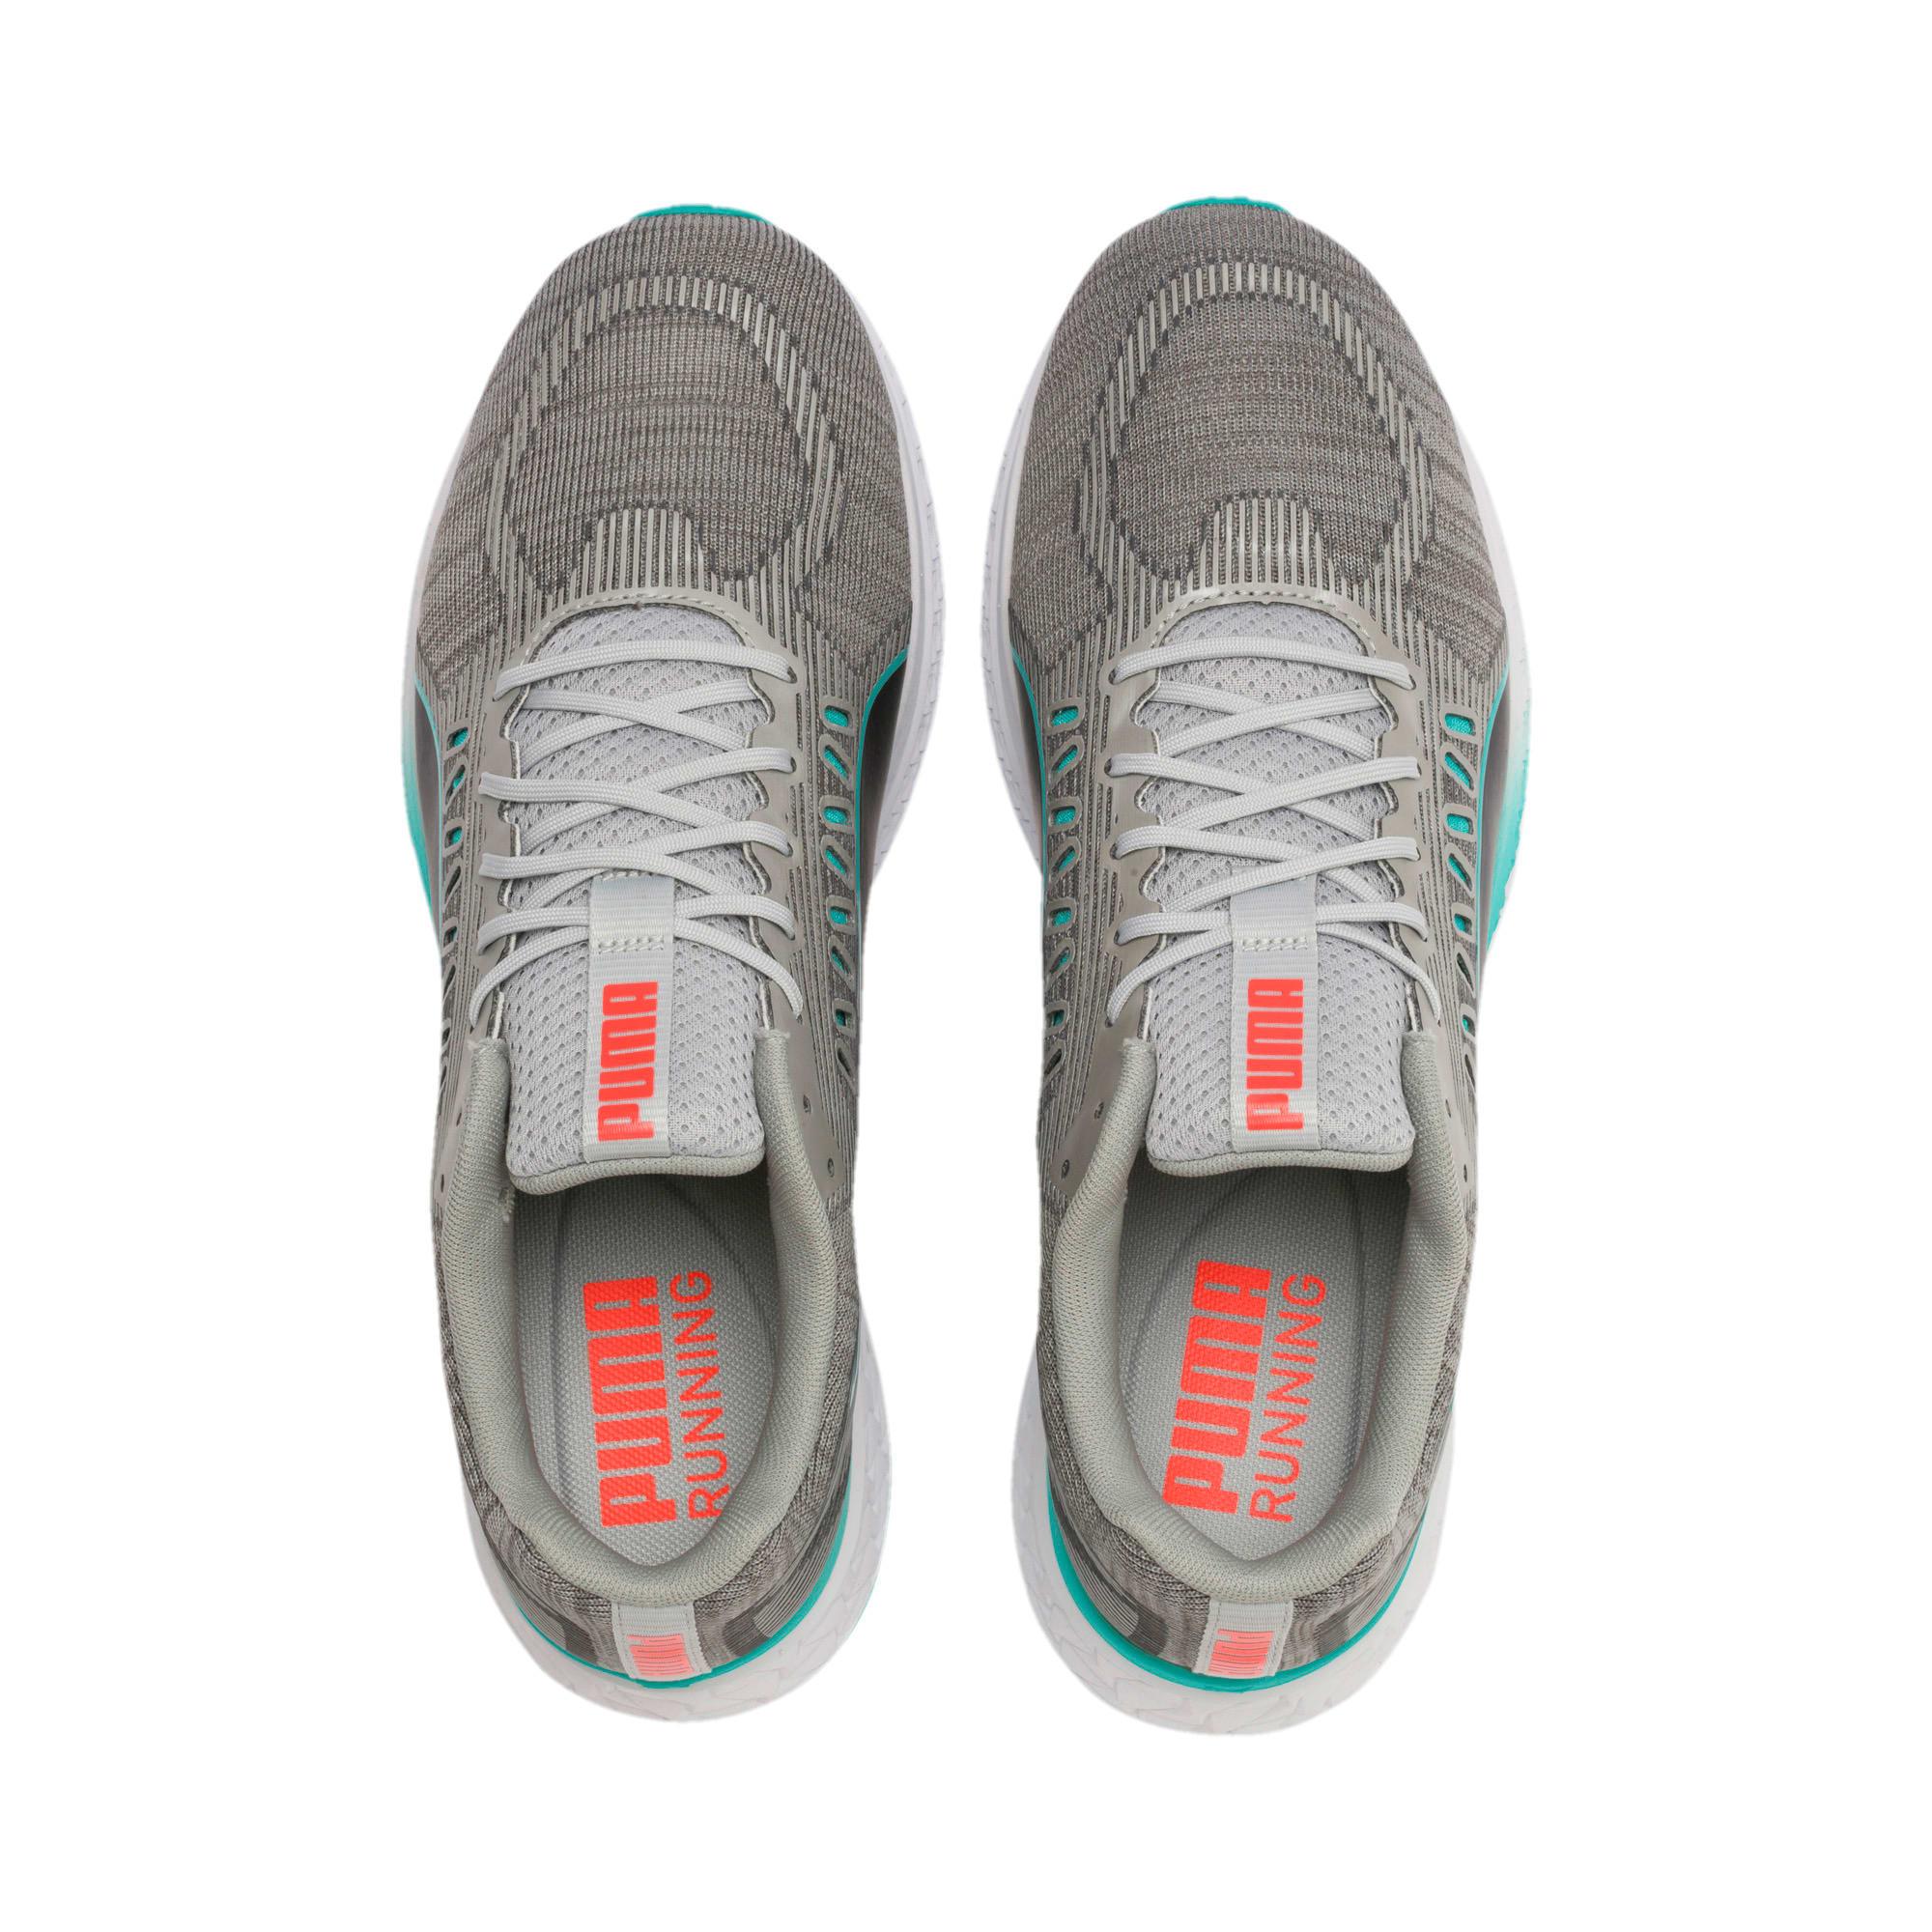 Thumbnail 8 of SPEED SUTAMINA Running Shoes, High Rise-Nrgy Red-Blue Turq, medium-IND